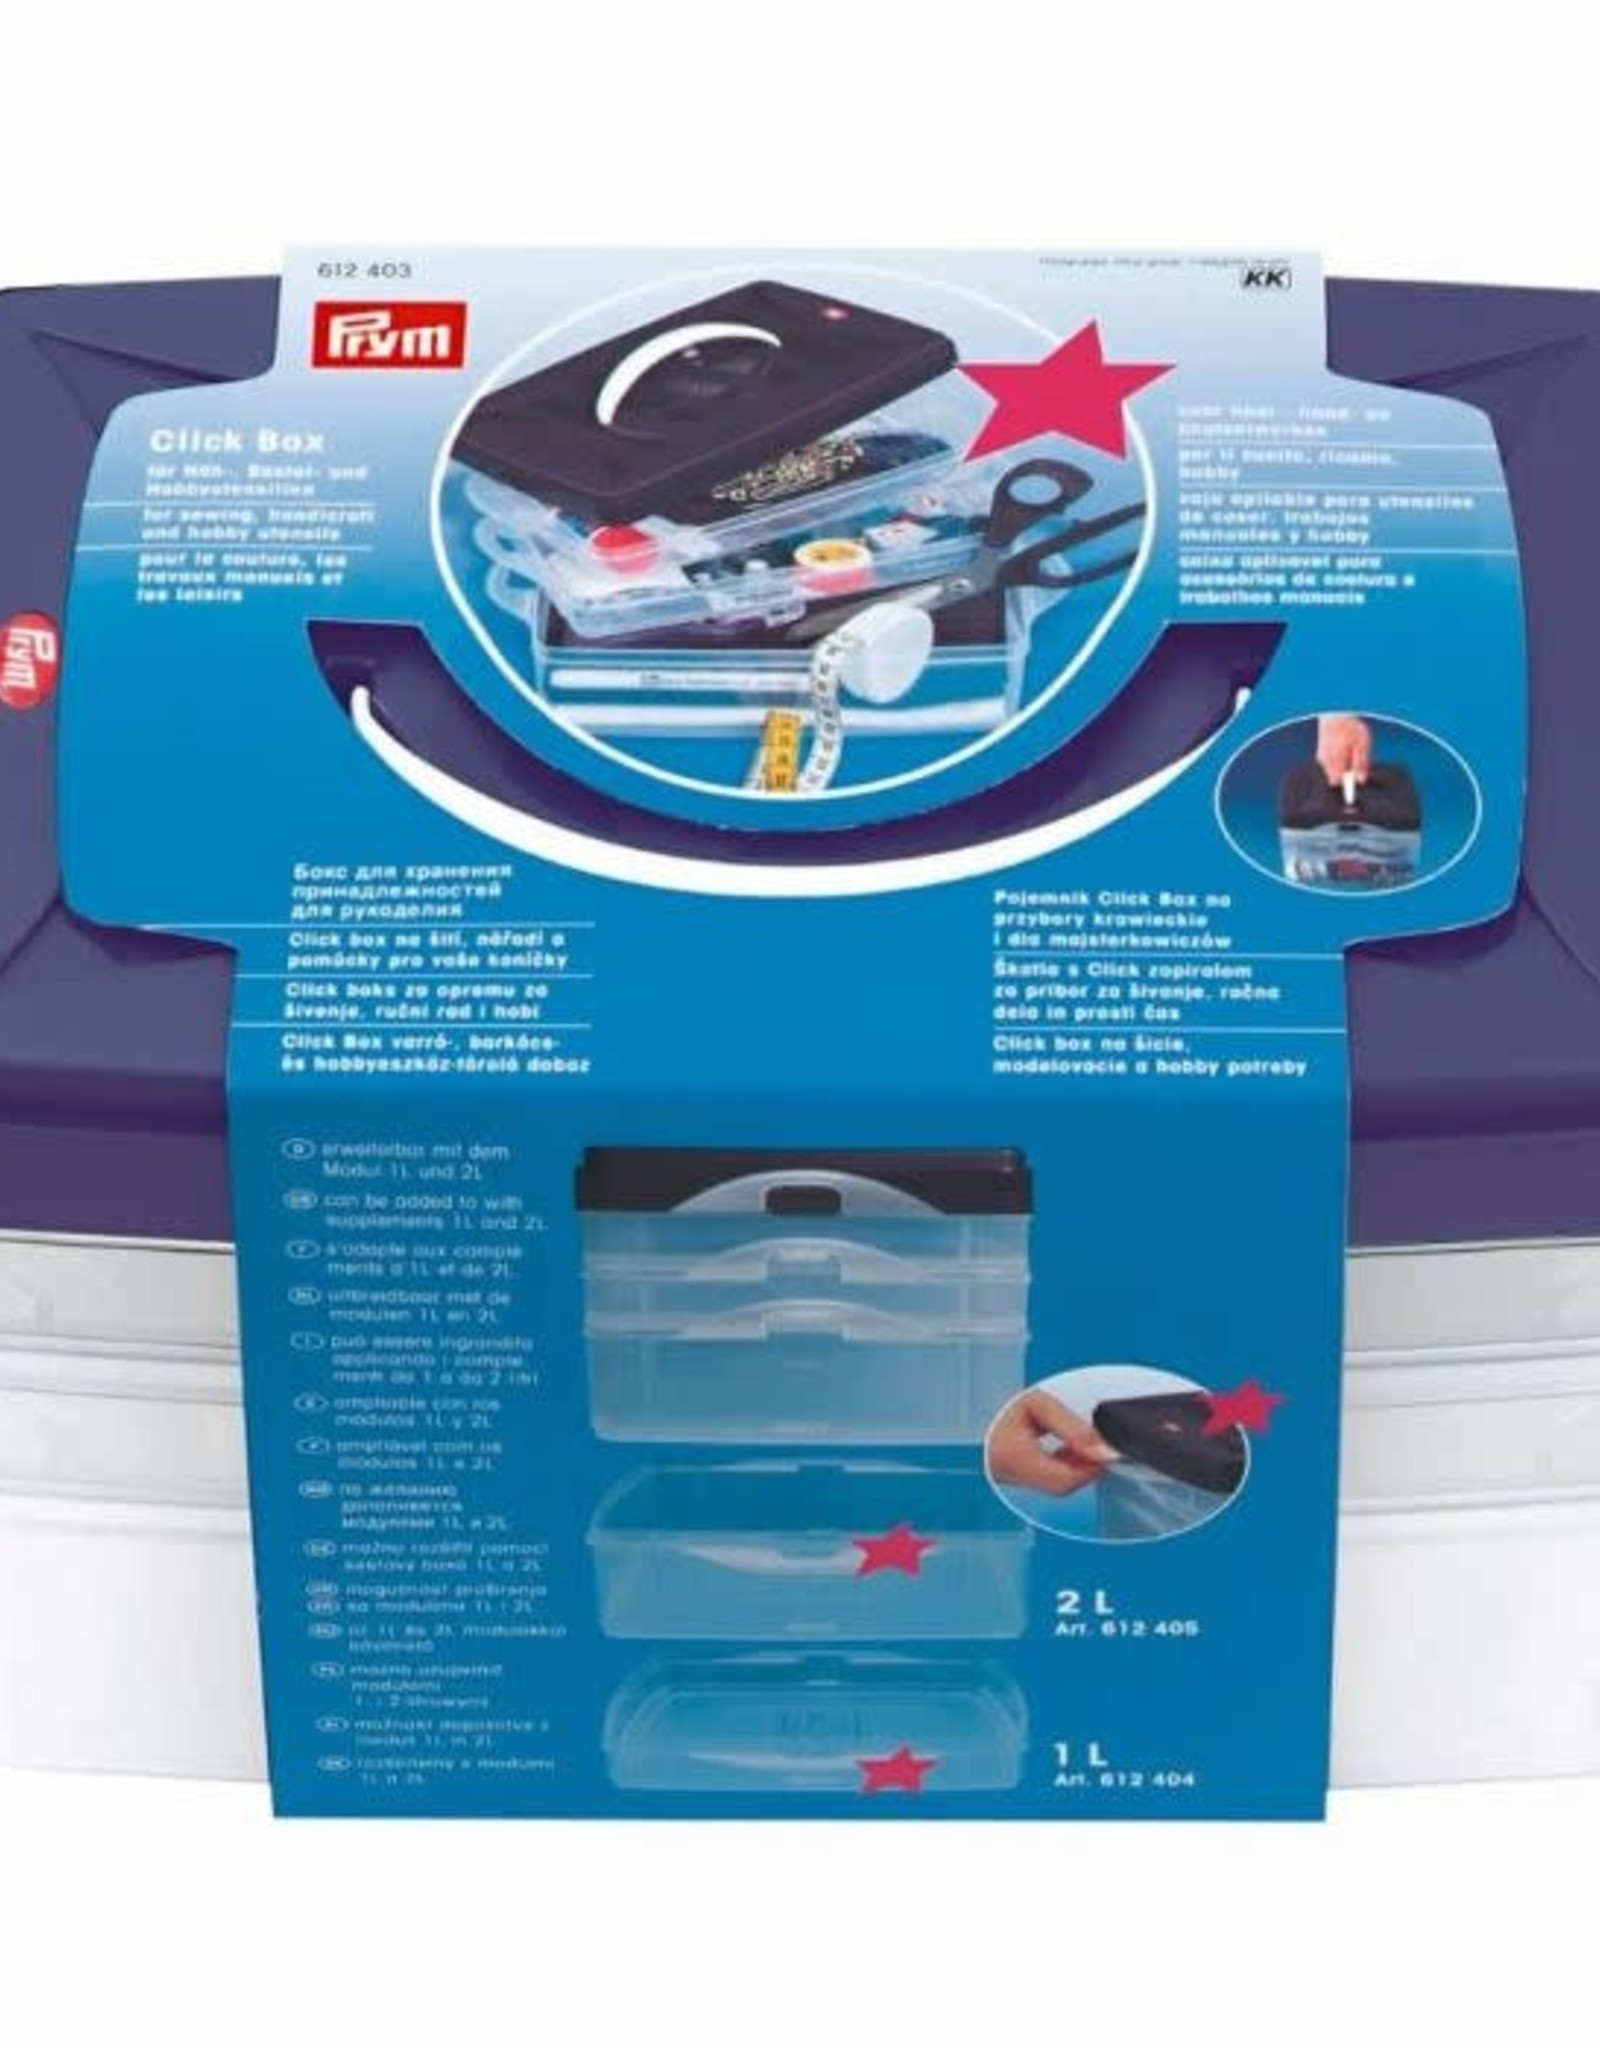 Prym Prym CLICKBOX BASISMODEL 24x16.5x14cm